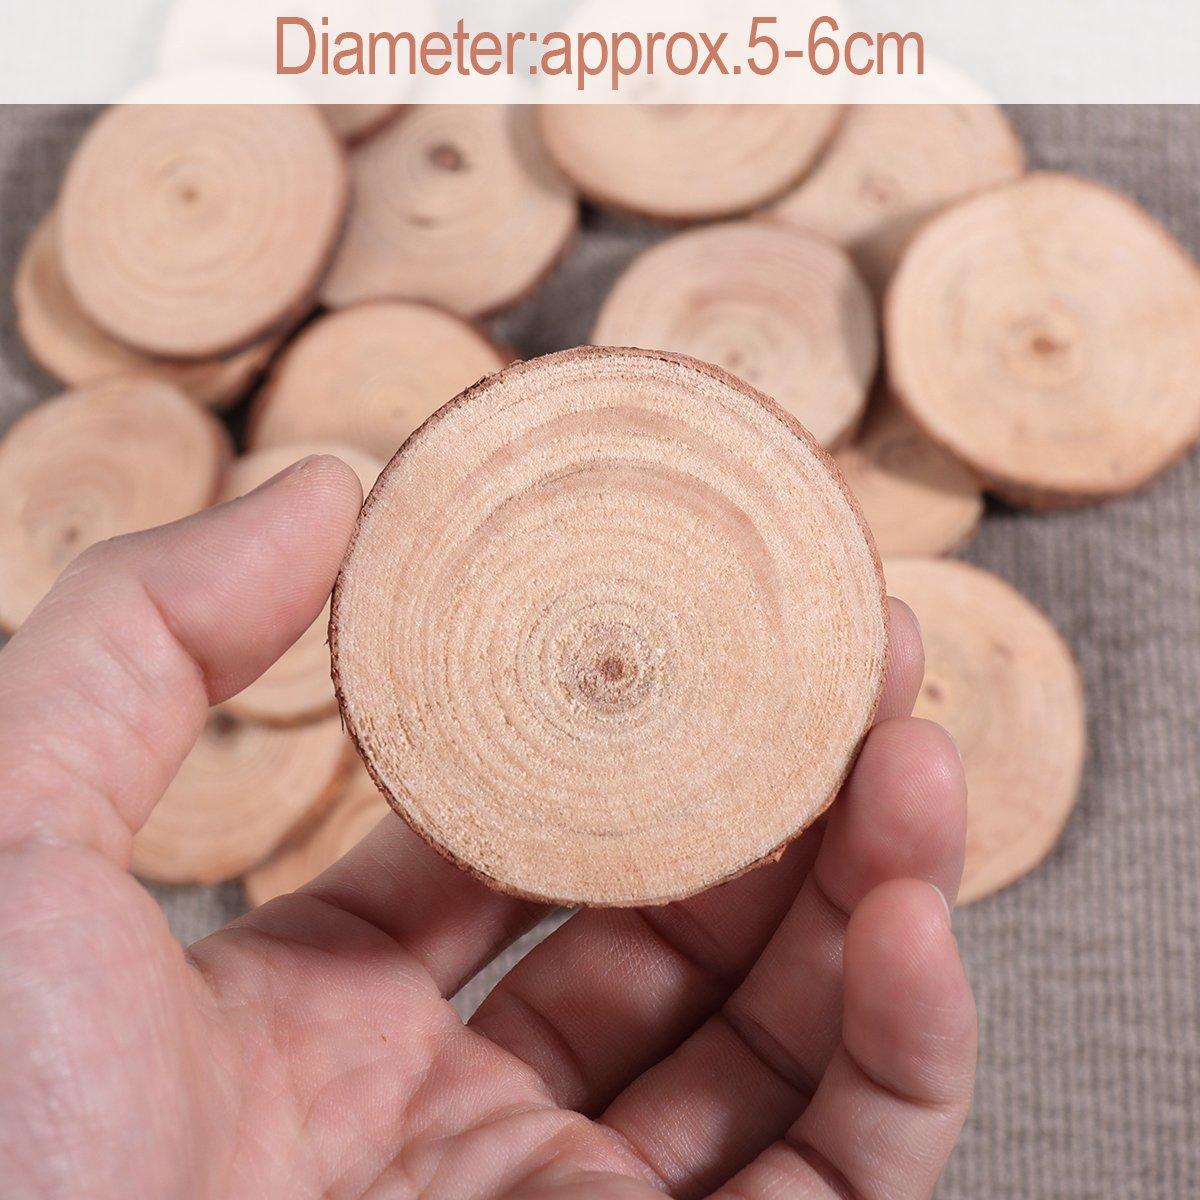 VORCOOL 20Stk Round colore legno vetro globalaffairs-legno 5-6 cm